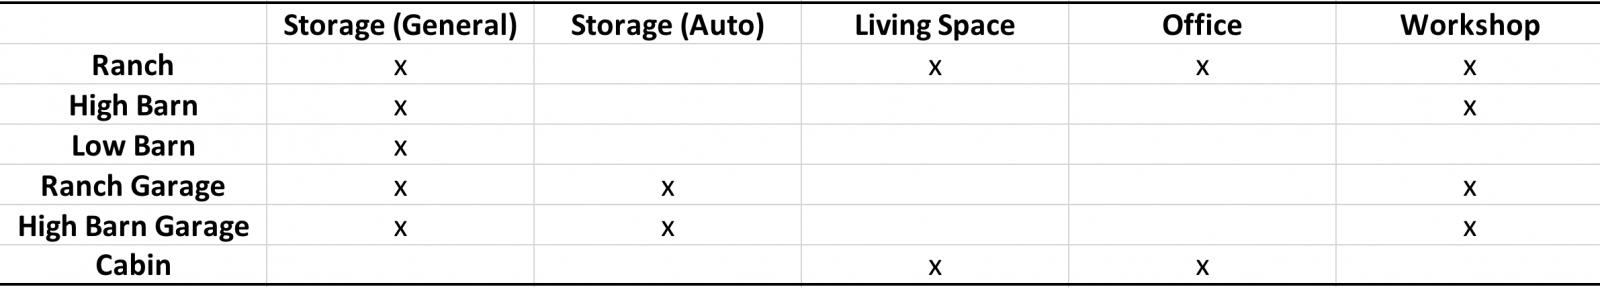 portable sheds usage chart